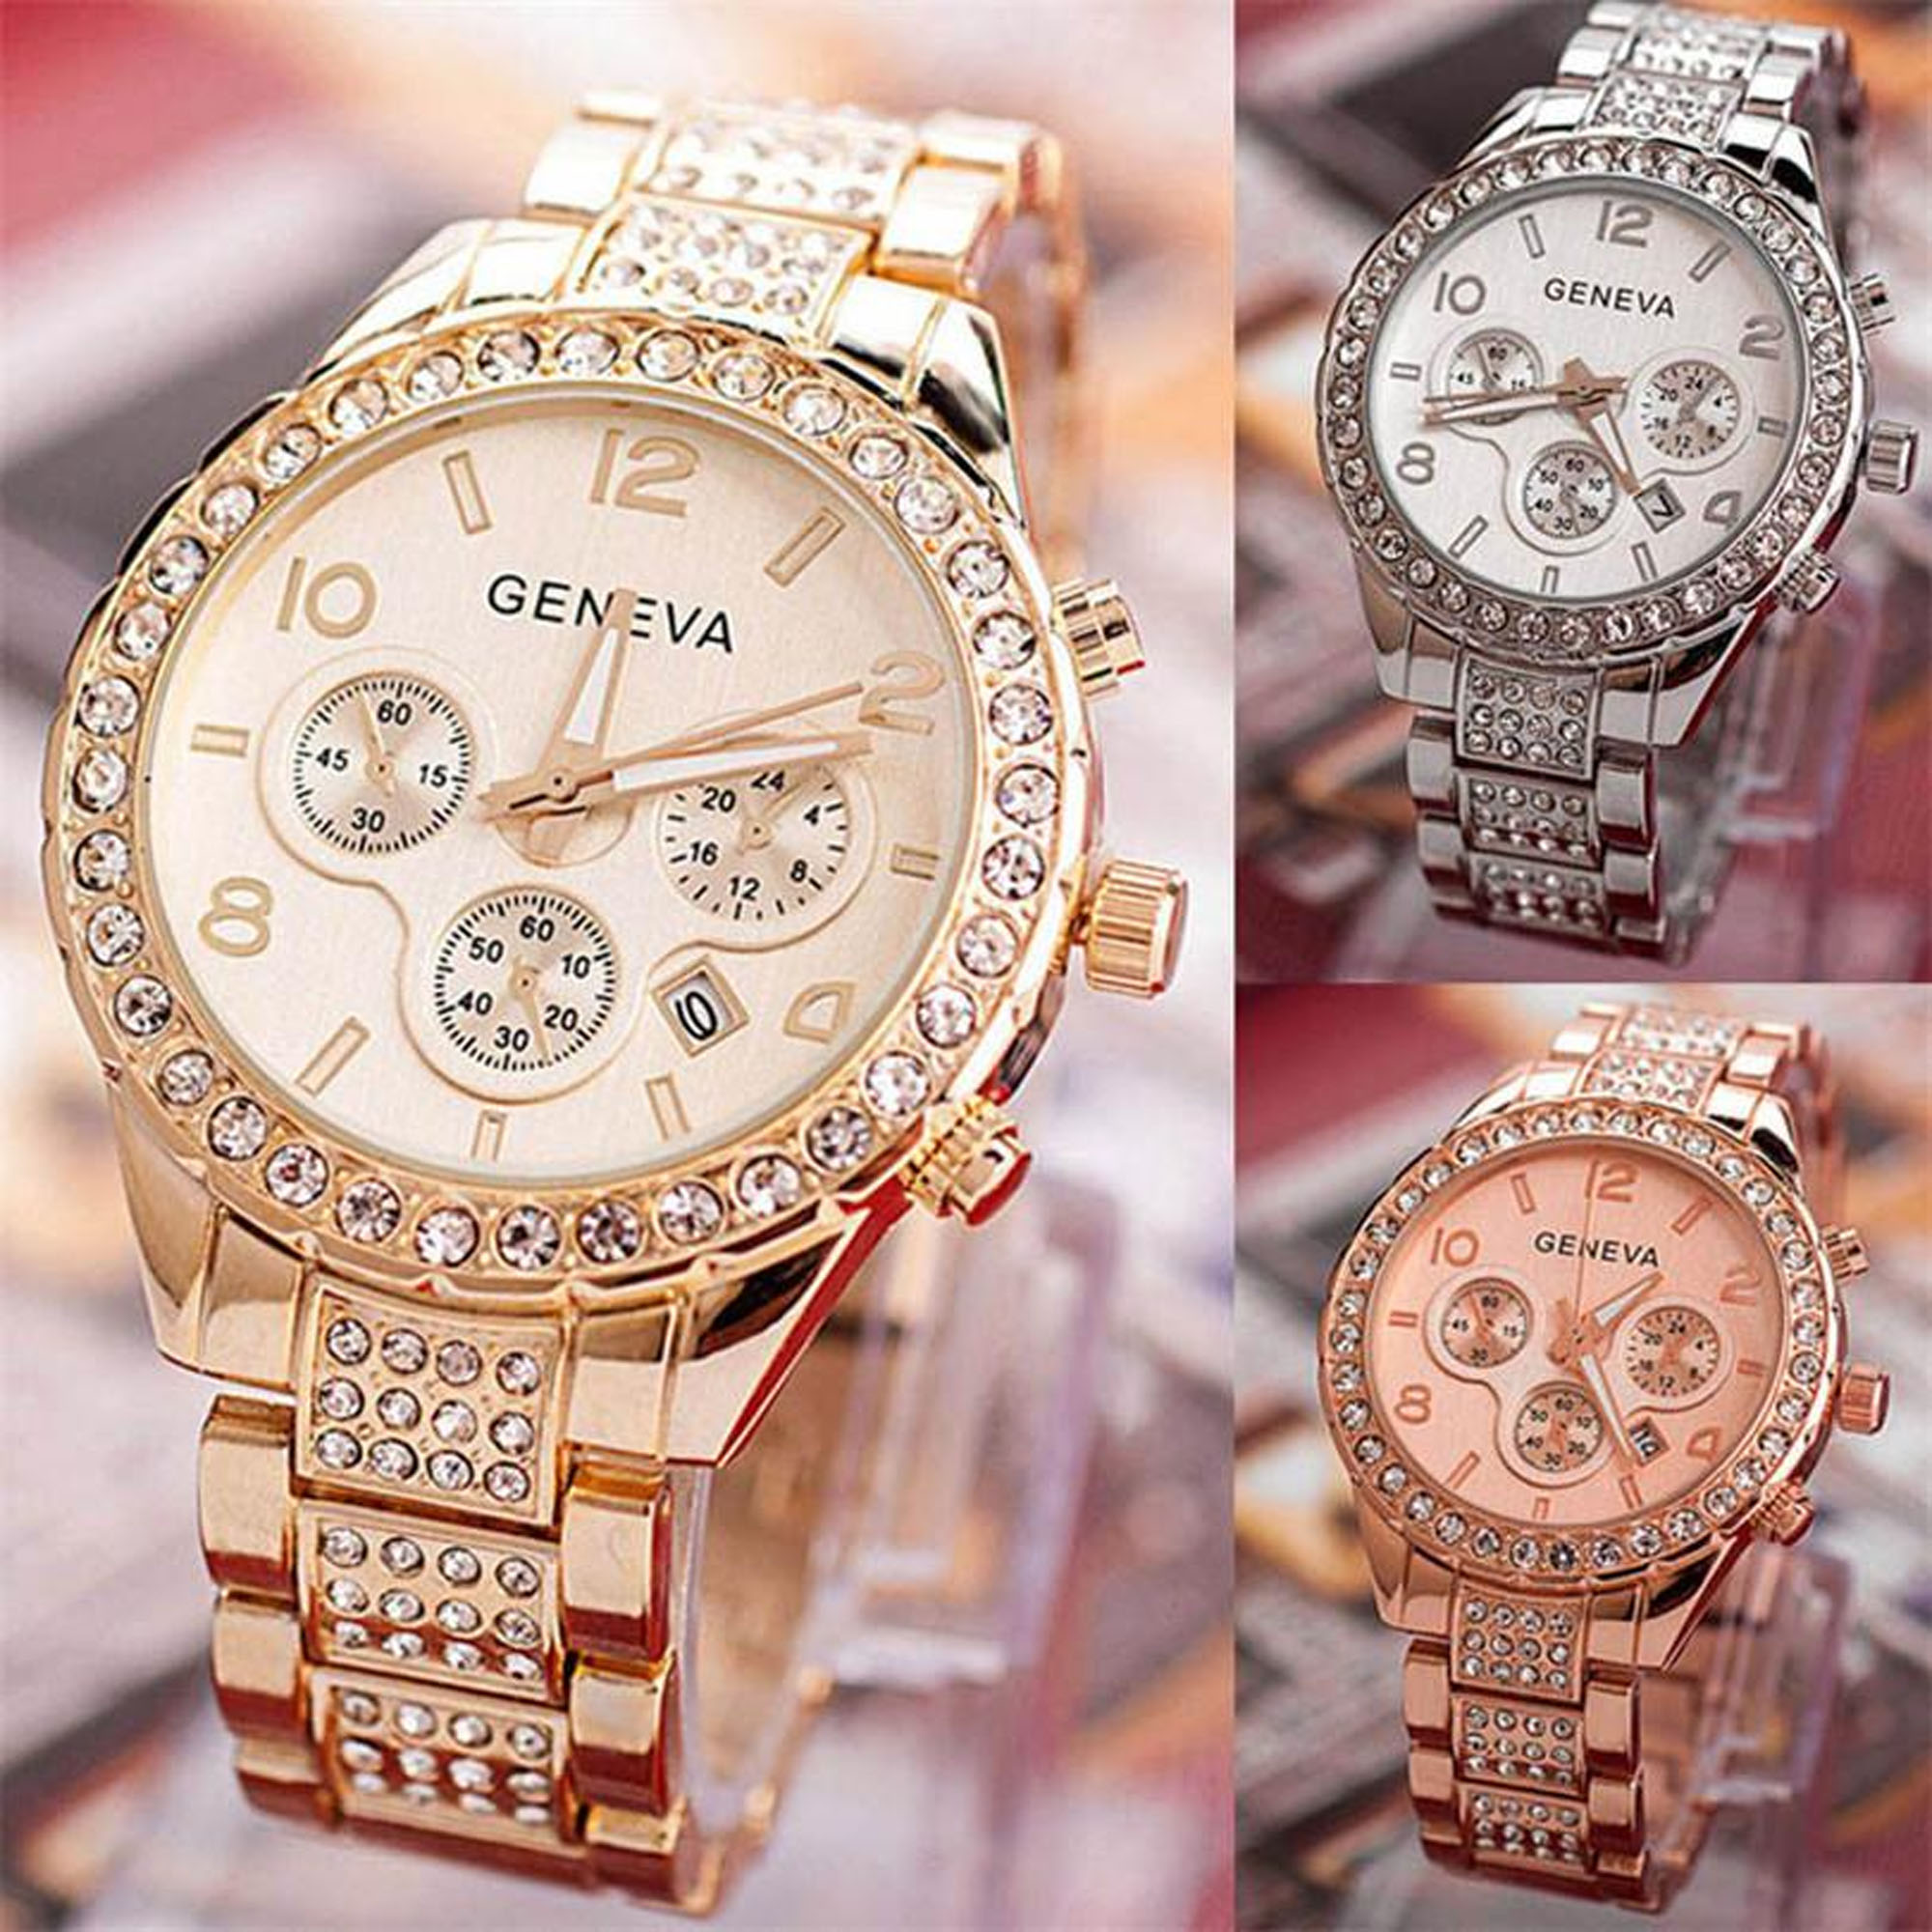 galery shop j8-cod- jam tangan wanita tahan air anti karat mewah diamond full quartz casual bahan stainless stell/jam tangan fashion wanita new arival /jam tangan korea korean style/jam tangan cantik